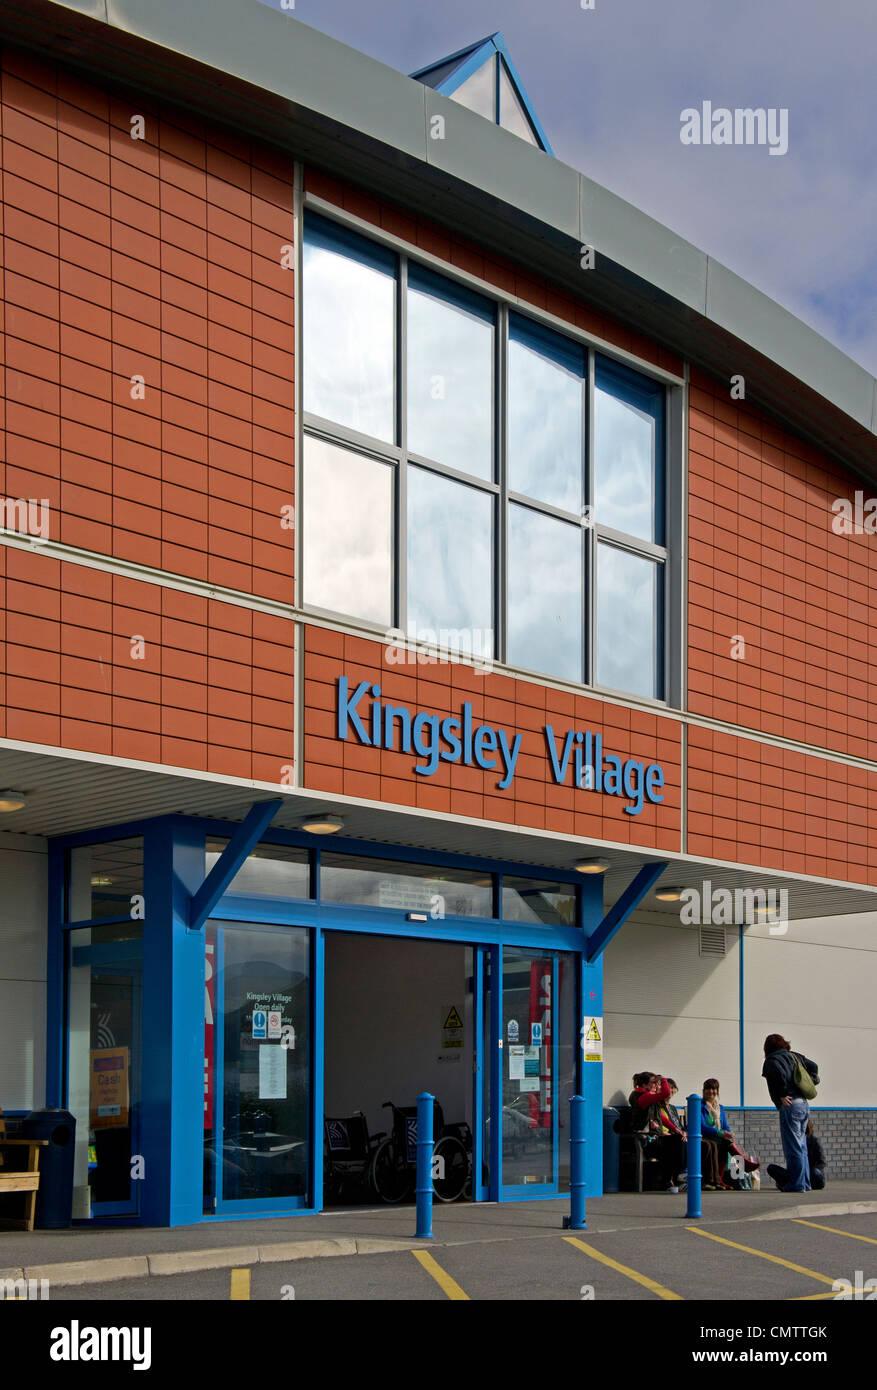 Kingsley village shopping center at Fraddon in Cornwall, UK - Stock Image